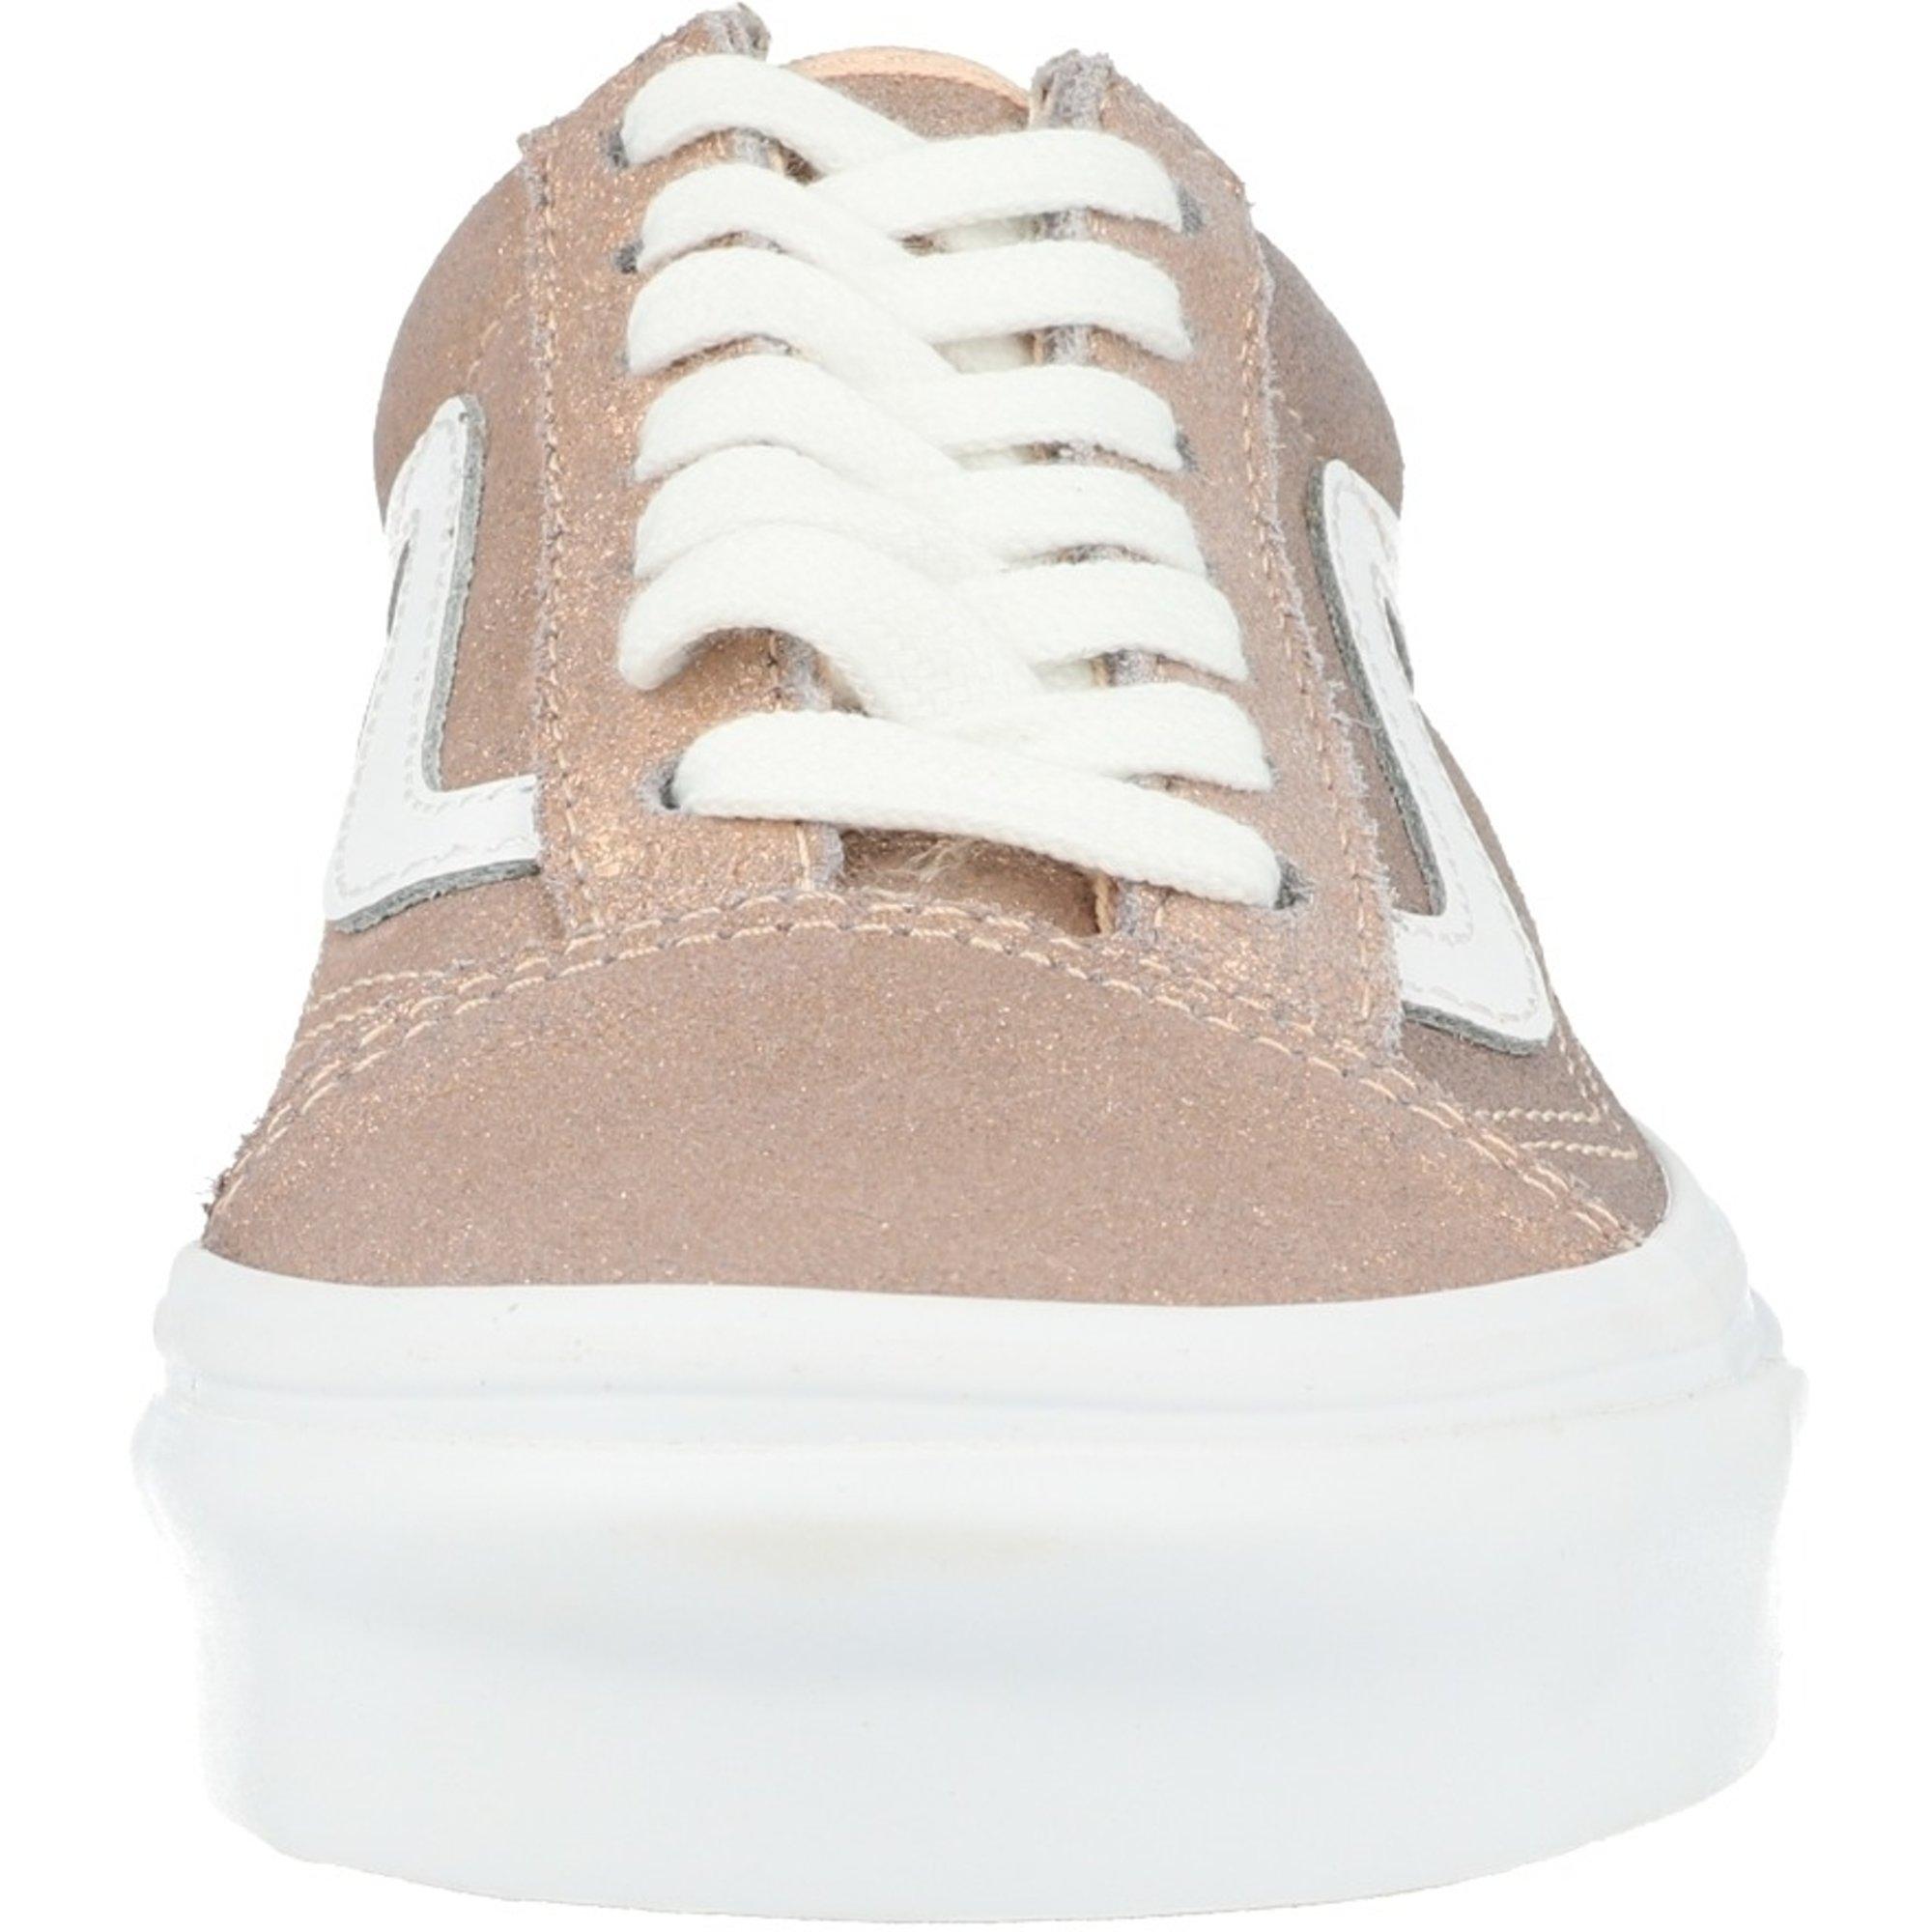 adidas Original Gazelle Sneaker Roses Damen. Größe 37 EU